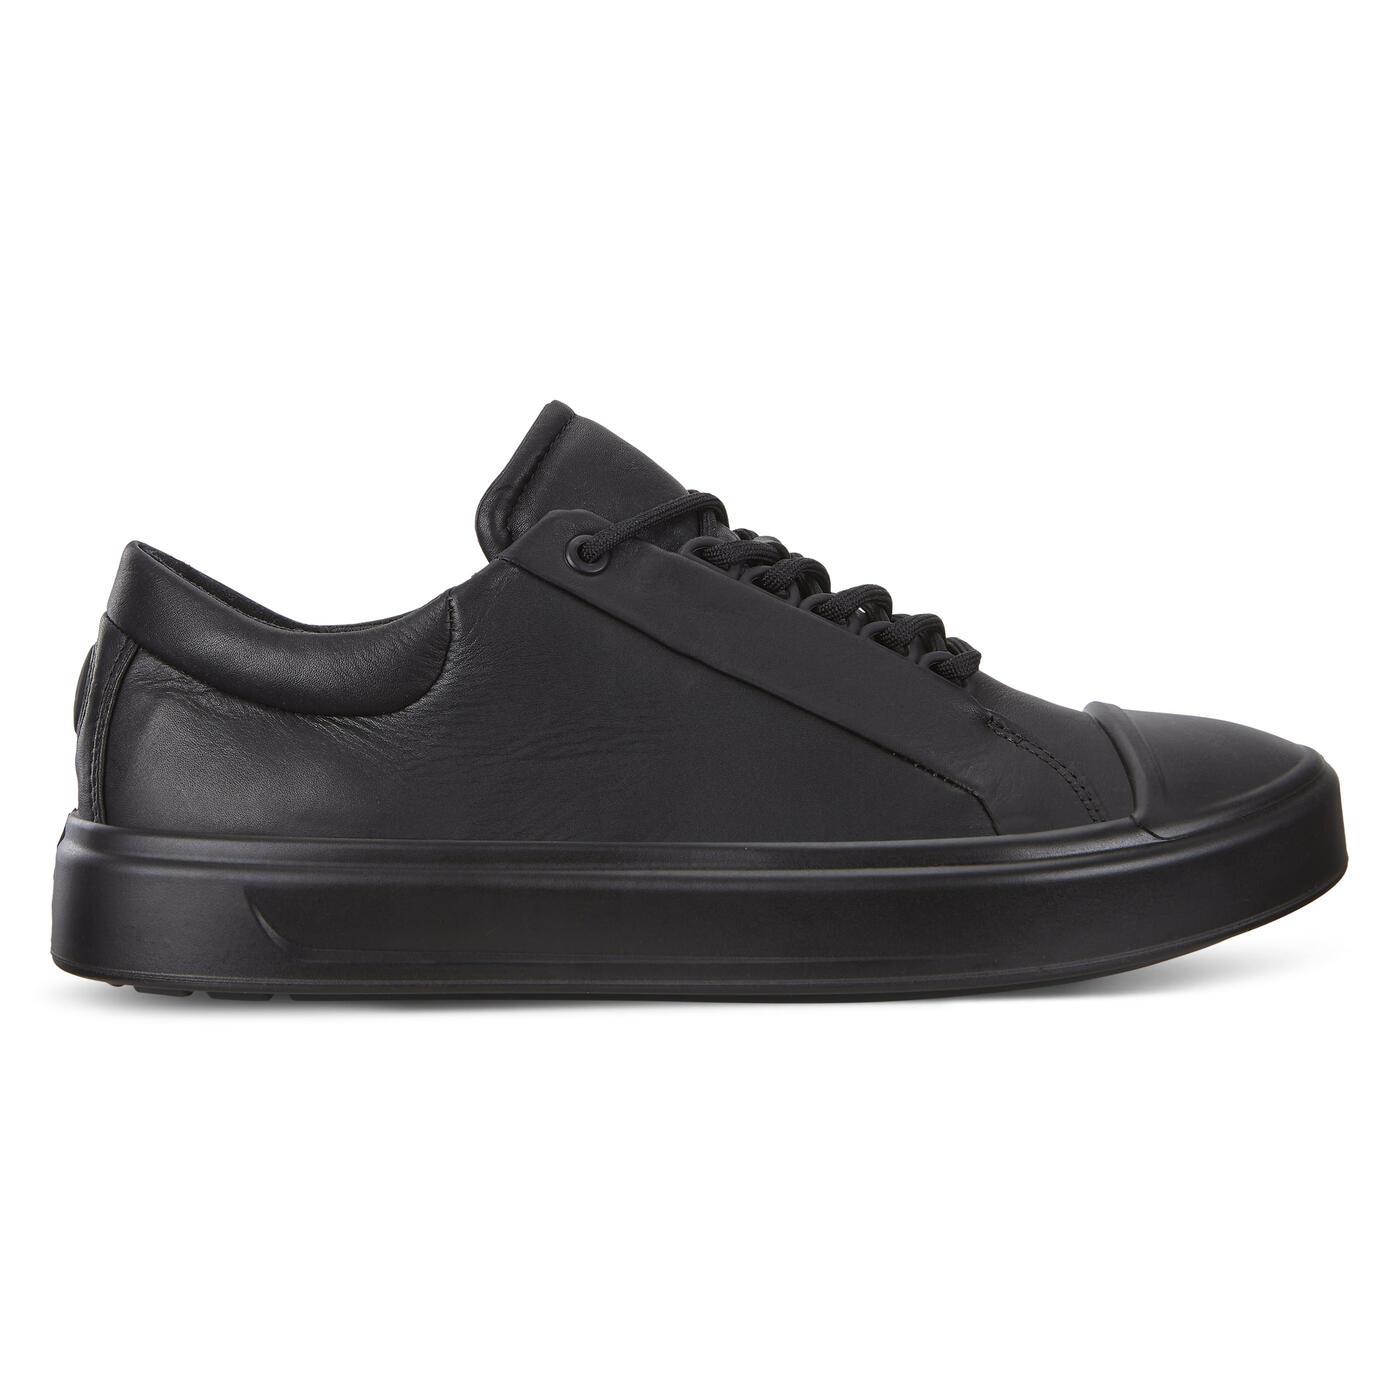 Ecco Men's Sale: Flexure T-Cap Sneaker $63, Ecco Collin 2.0 Shoe $63 & More + Free Shipping